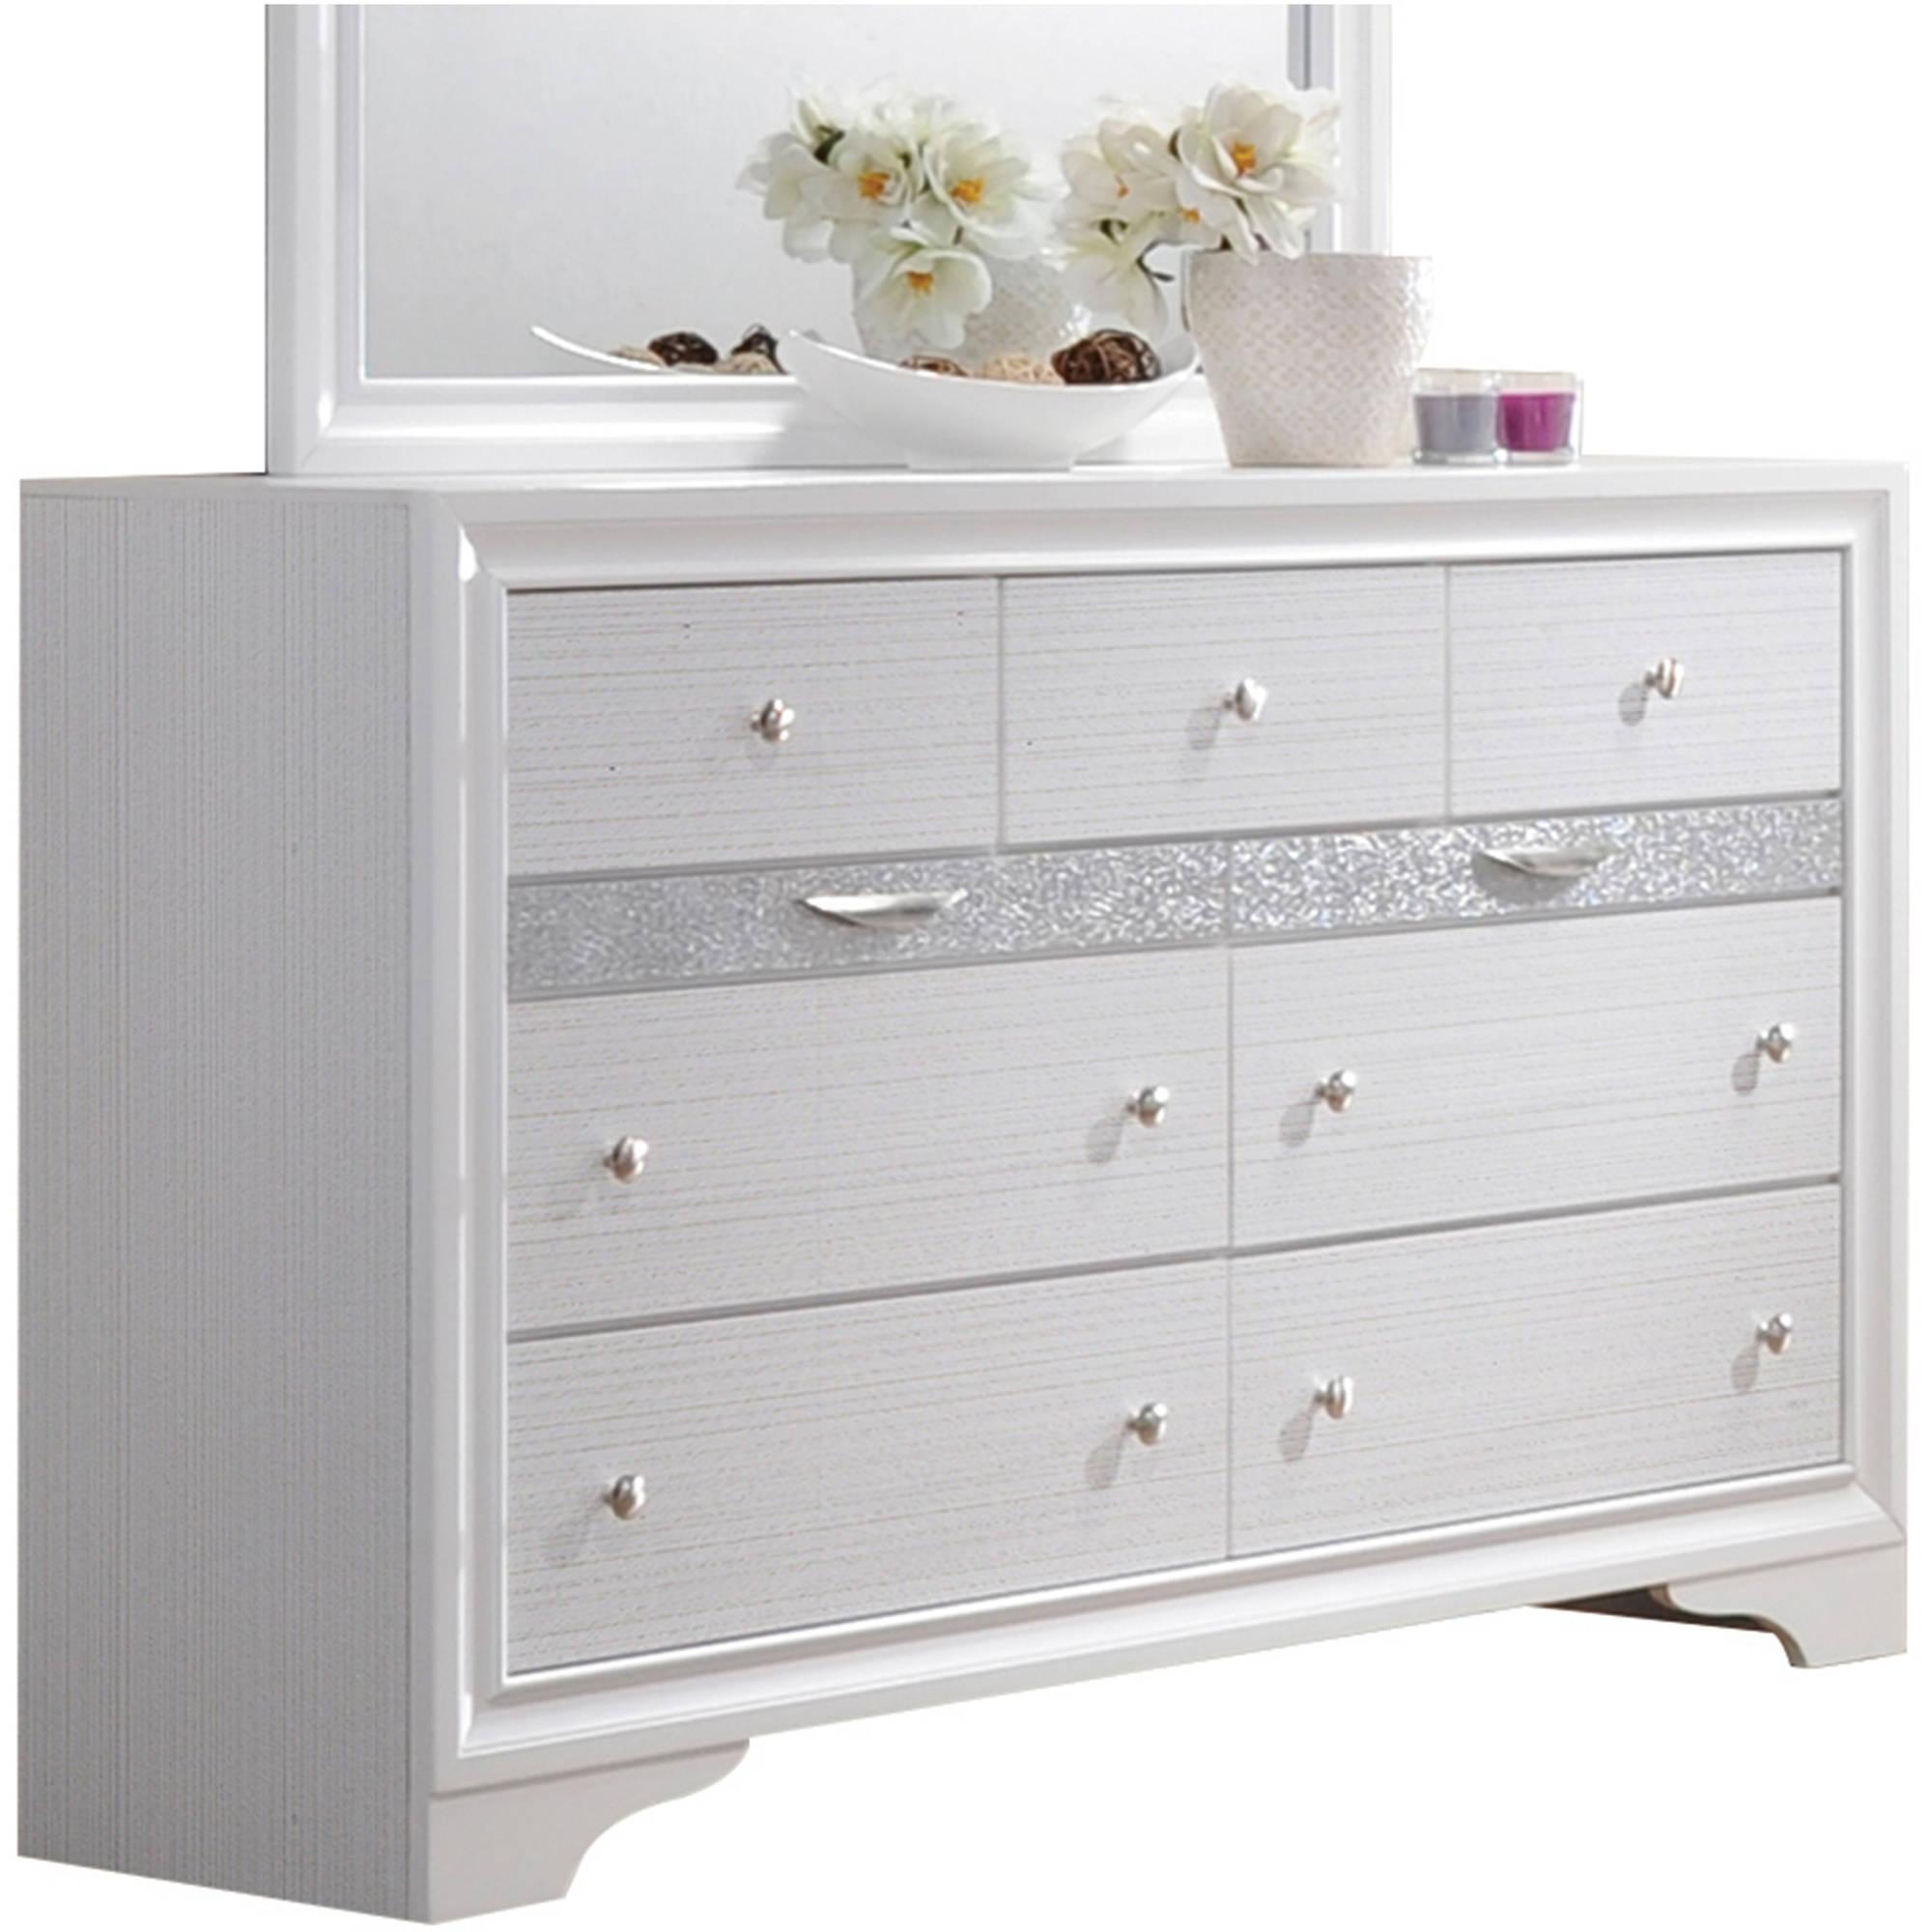 Acme Furniture Naima White Dresser with Nine Drawers